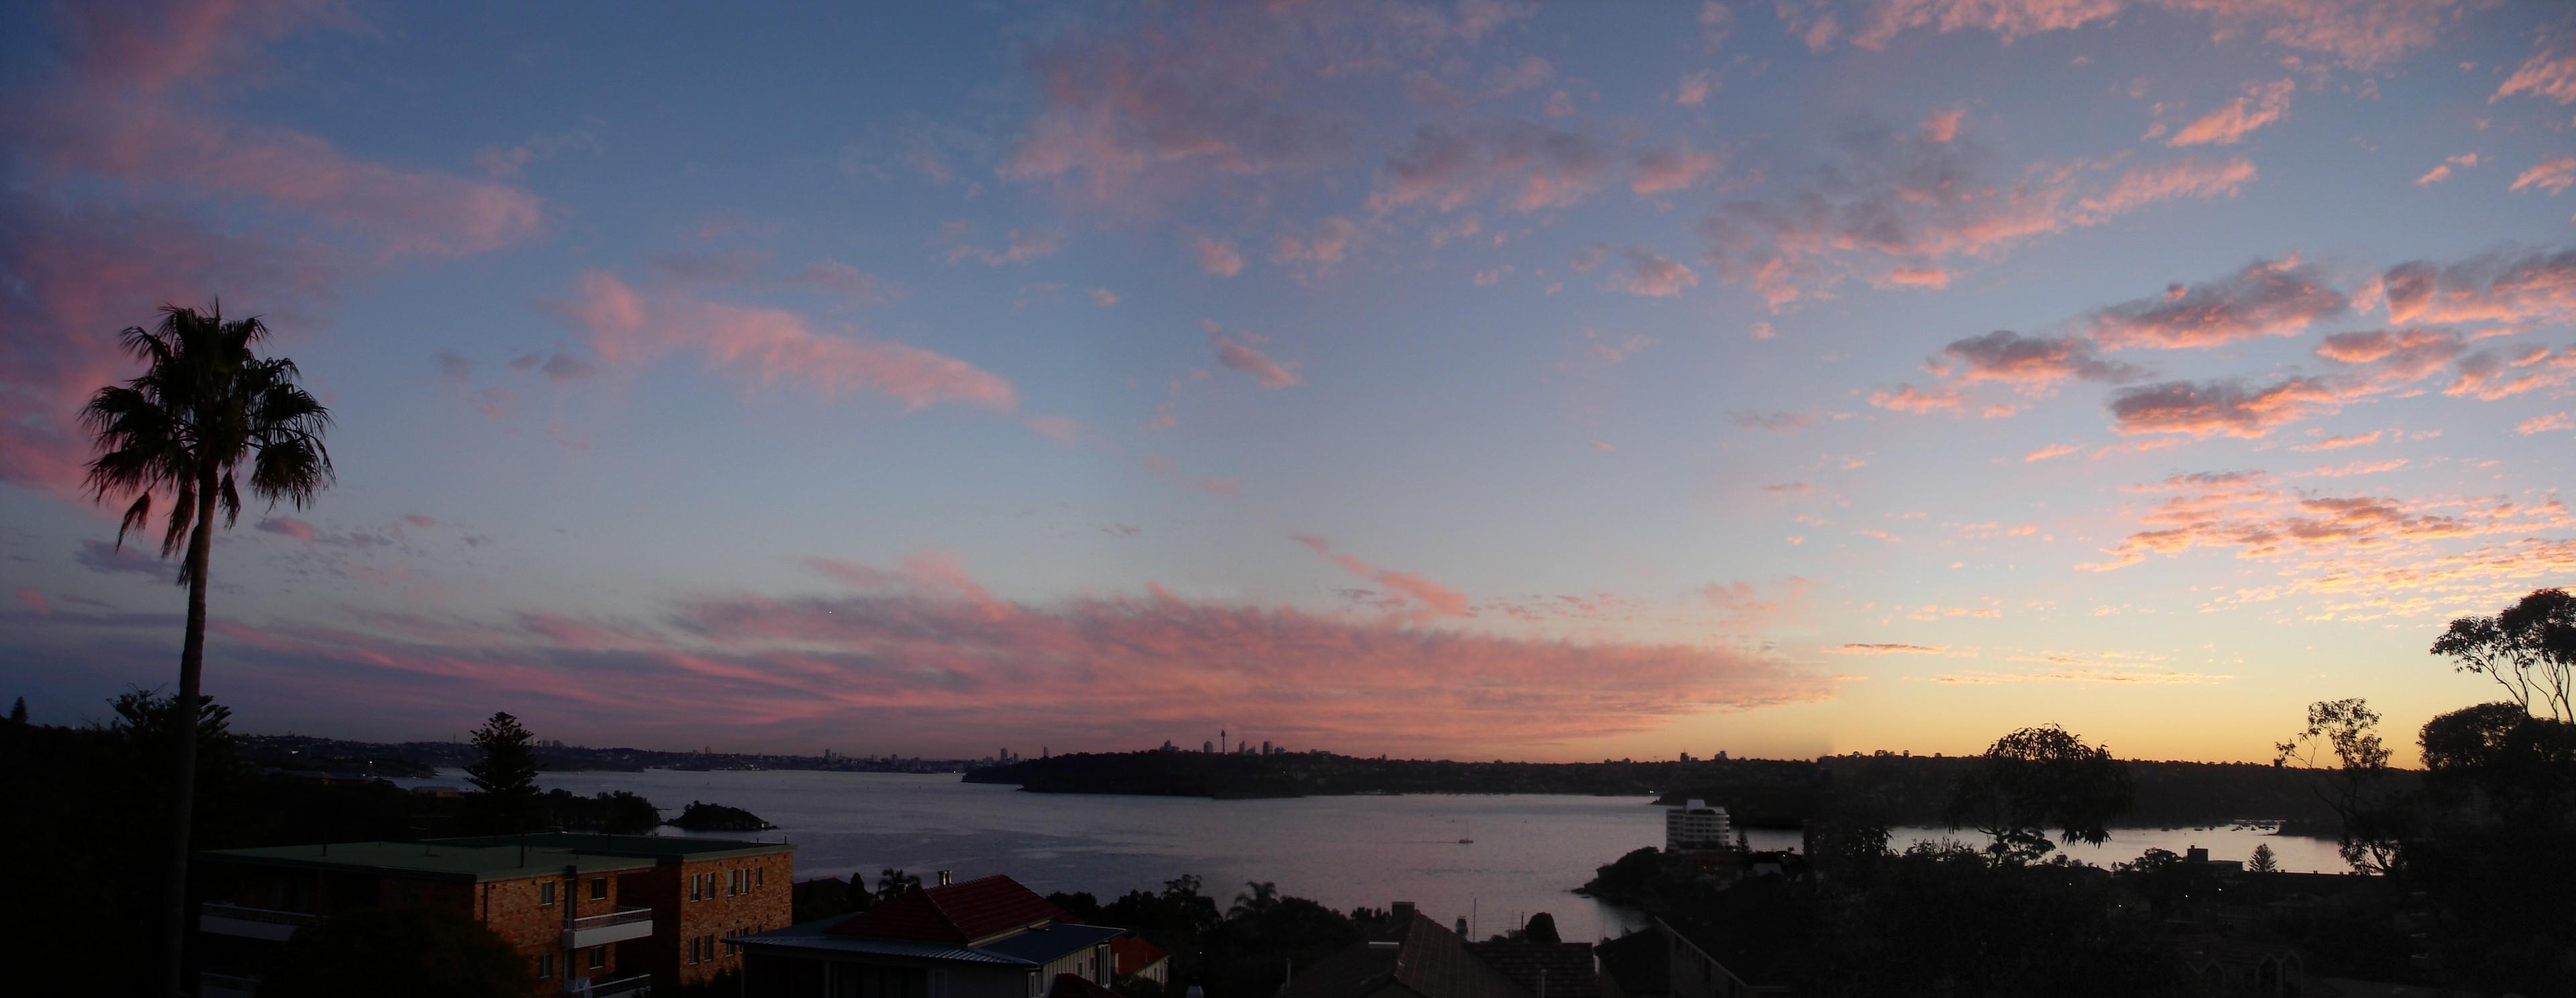 Sunset90.jpg